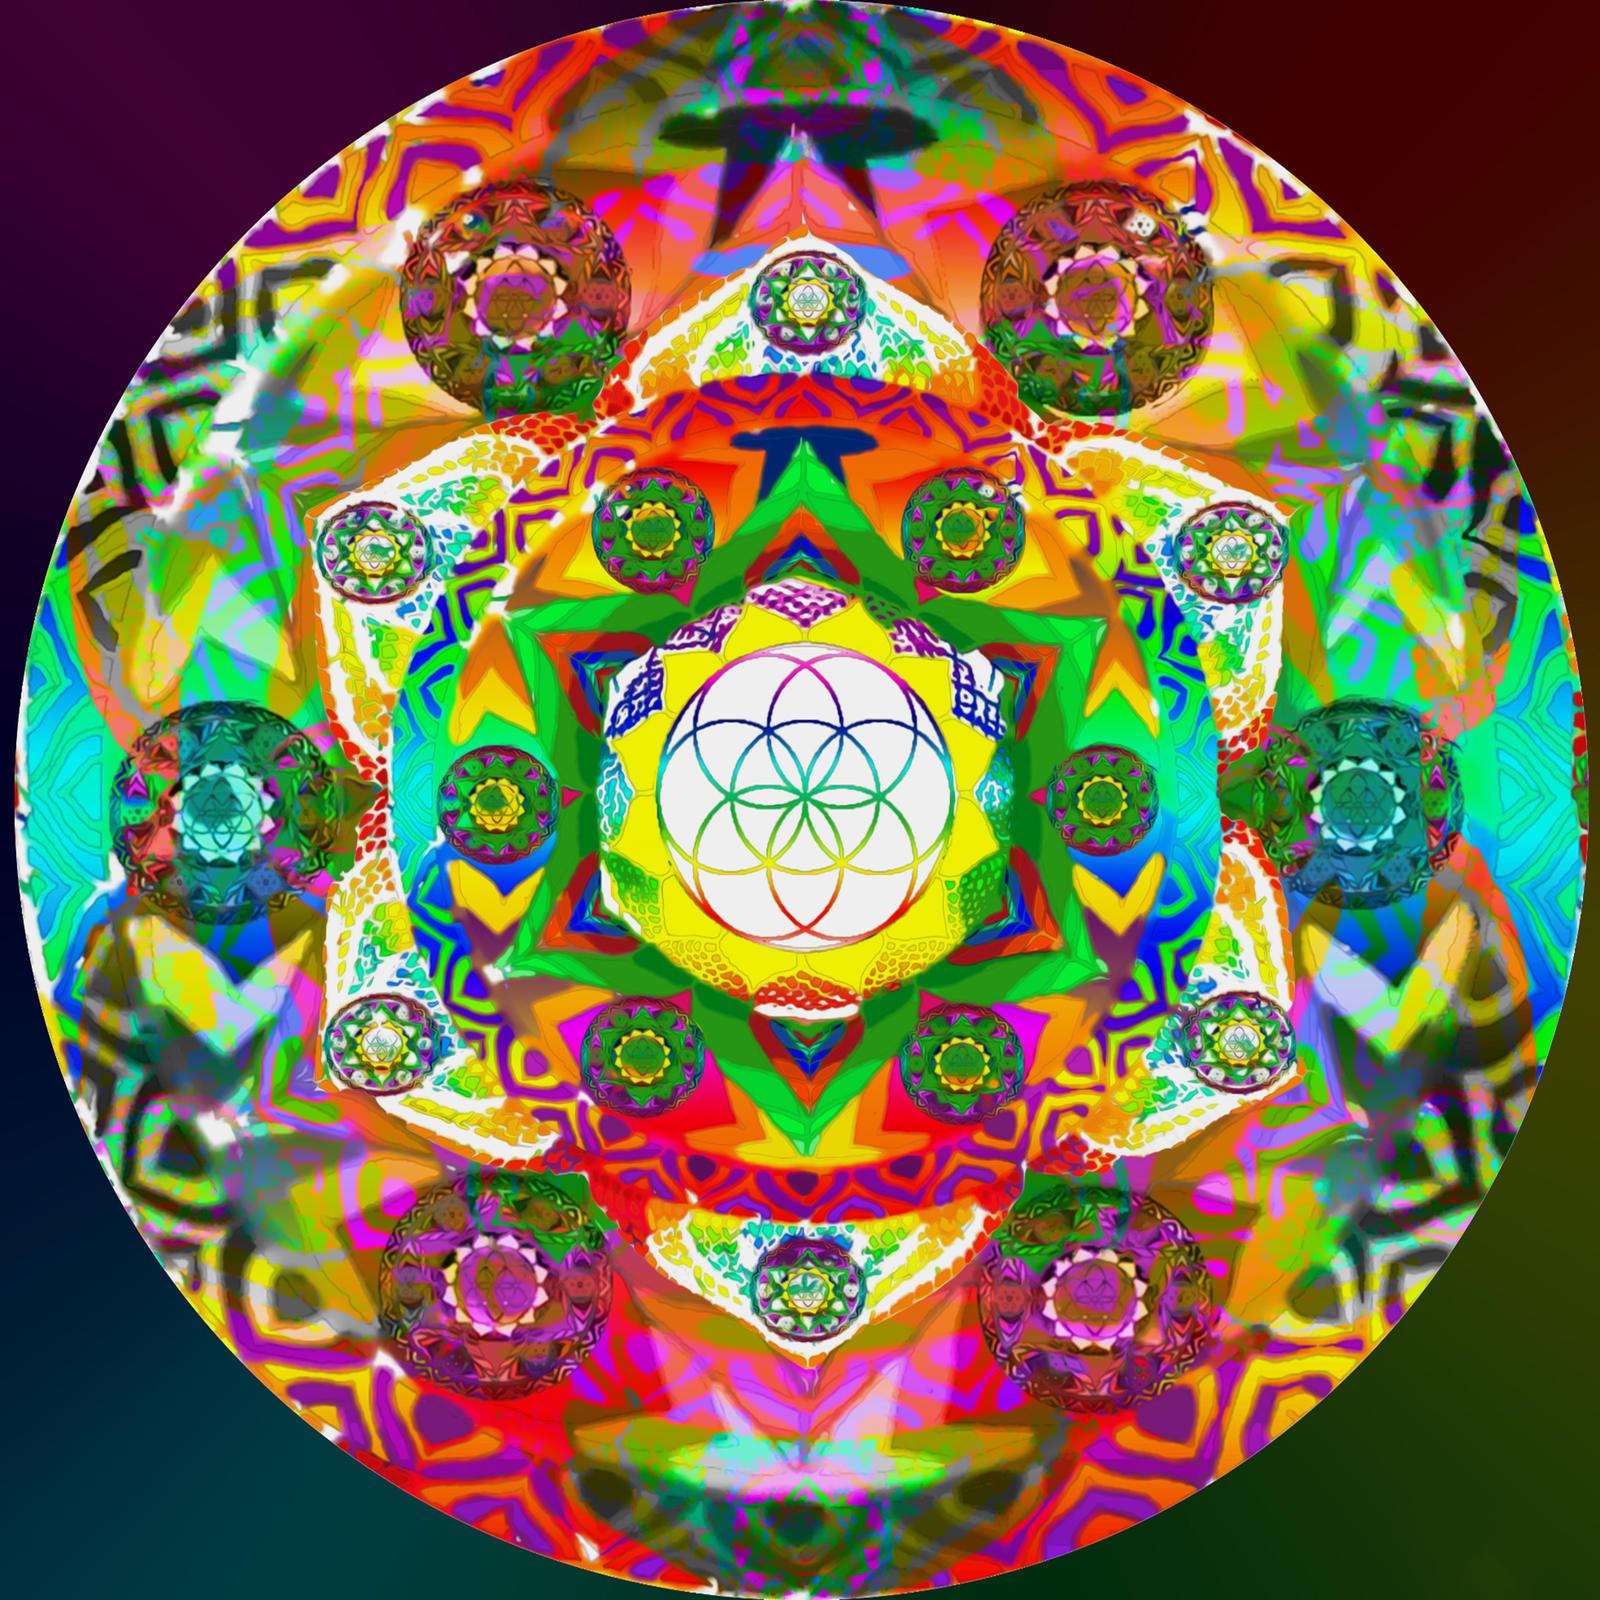 Flower of Life Mandala by massaad on DeviantArt